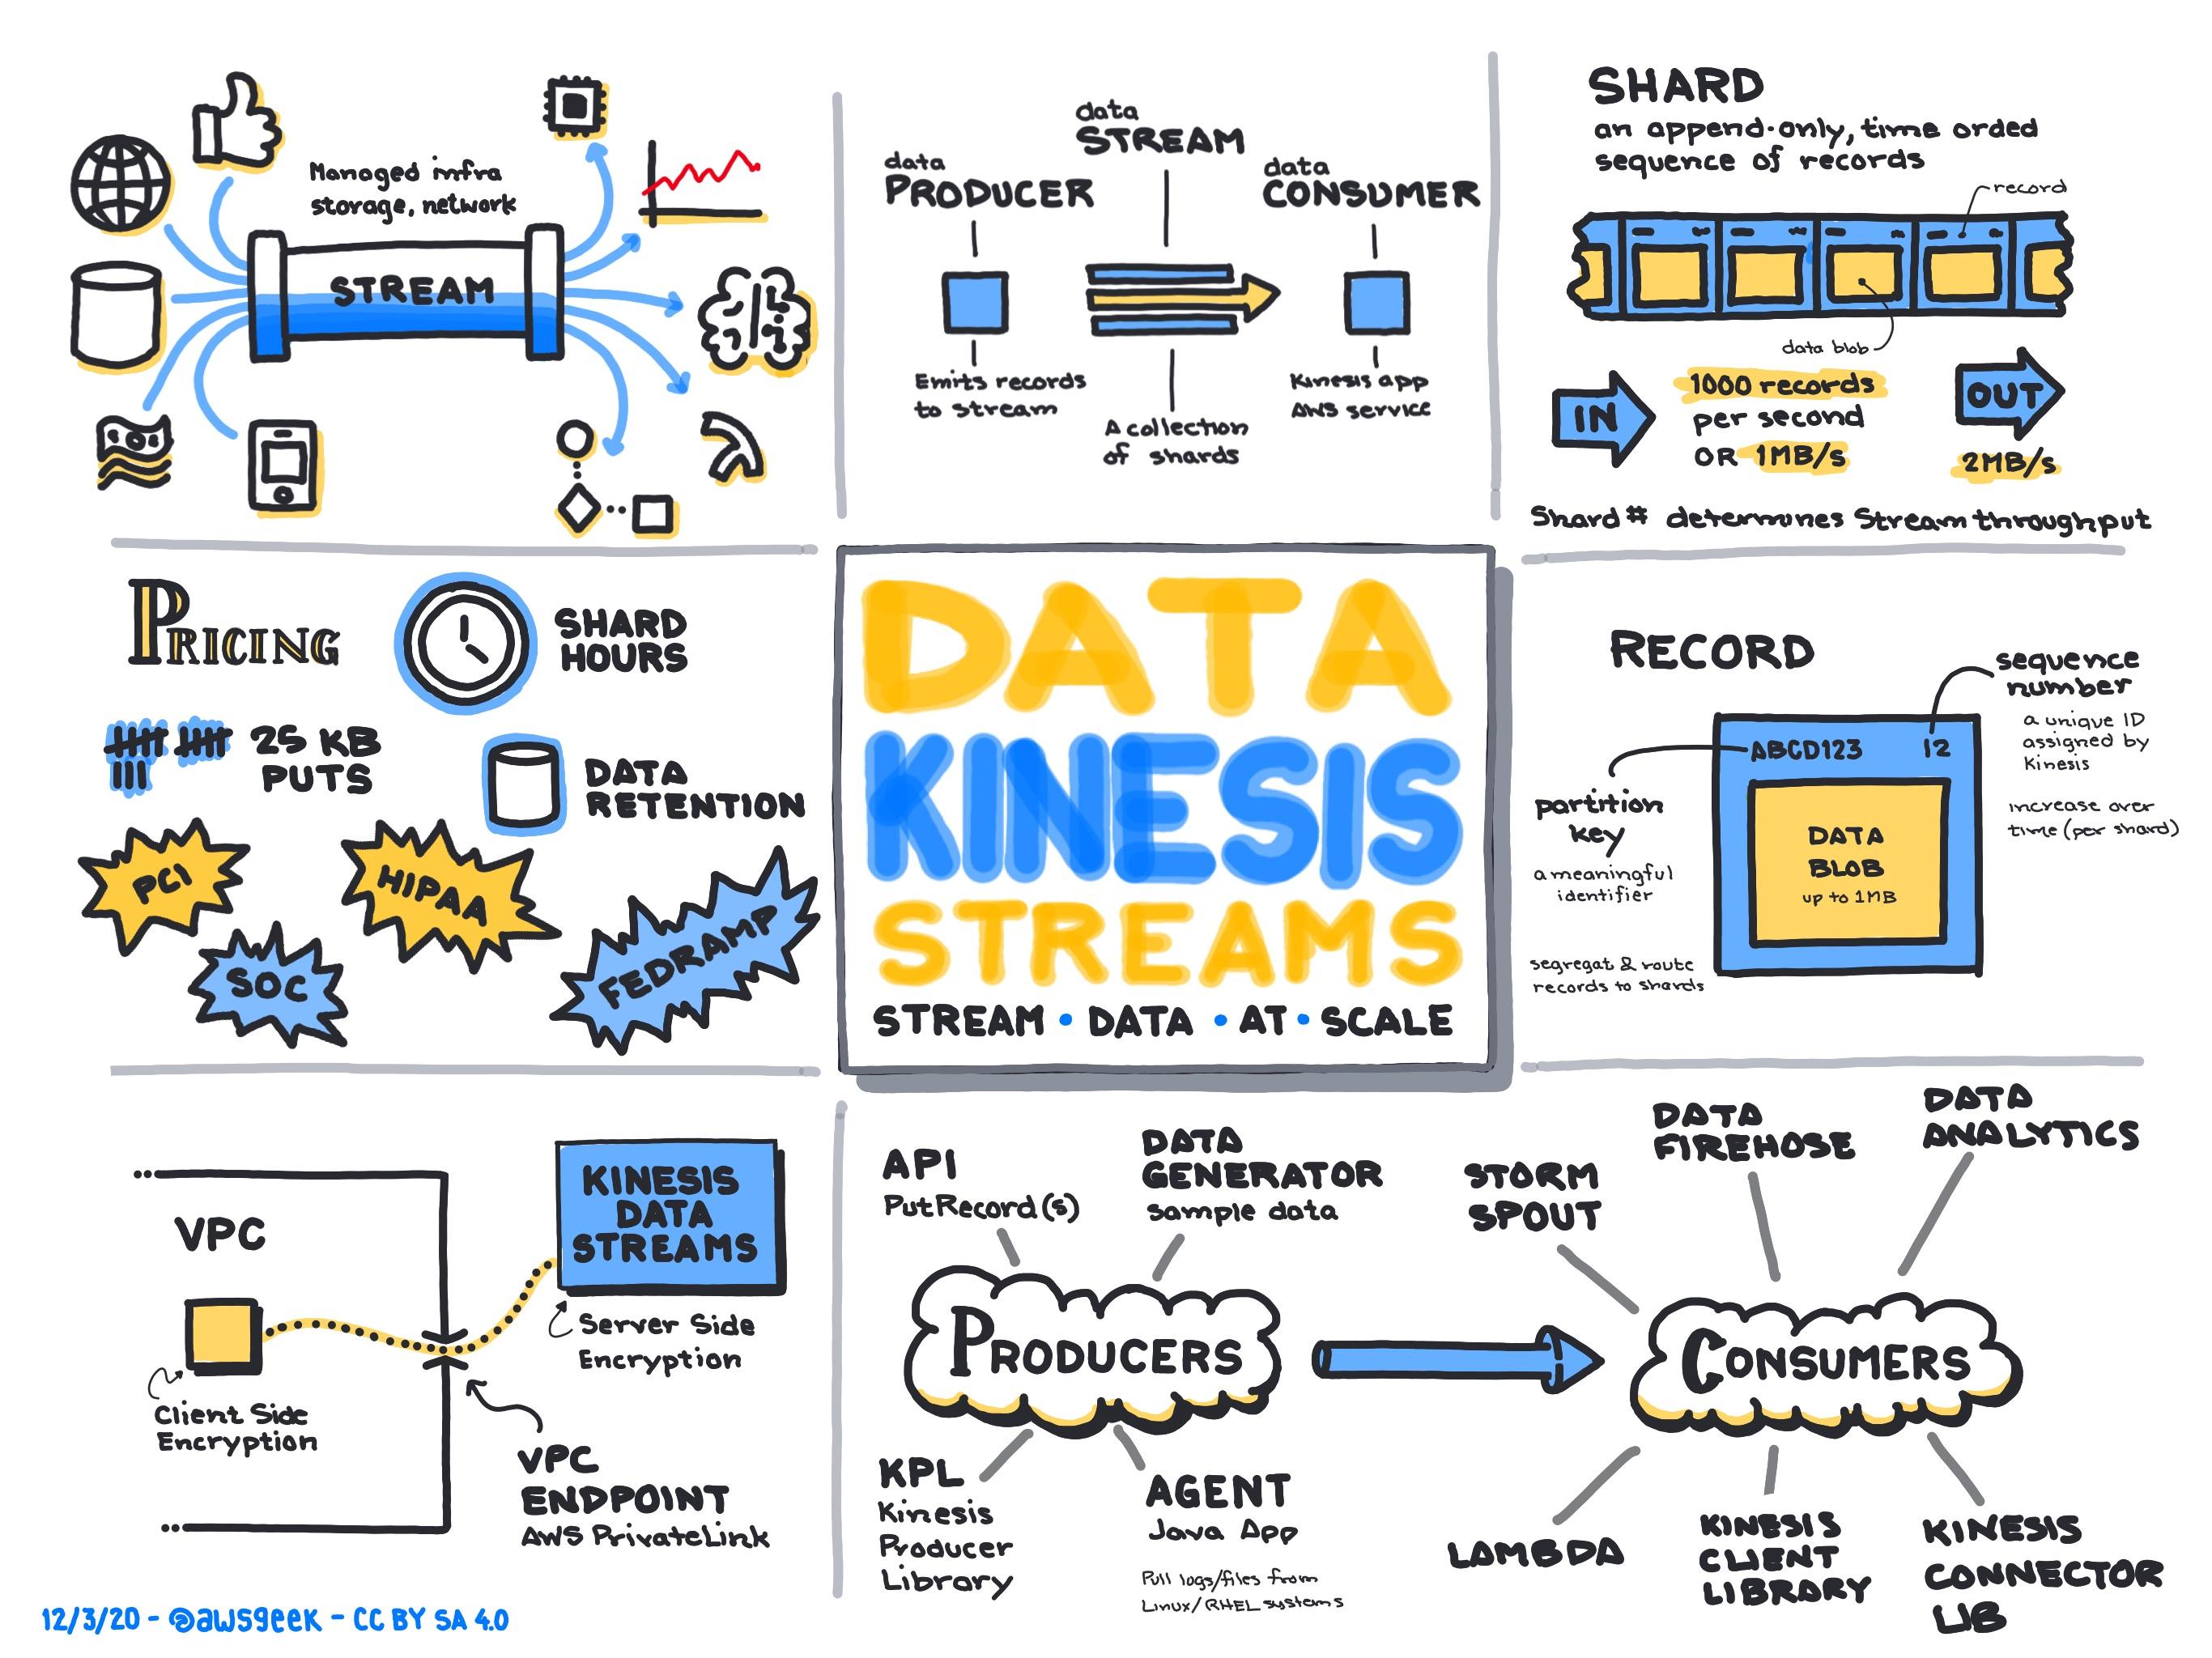 Amazon-Kinesis-Data-Streams.jpg